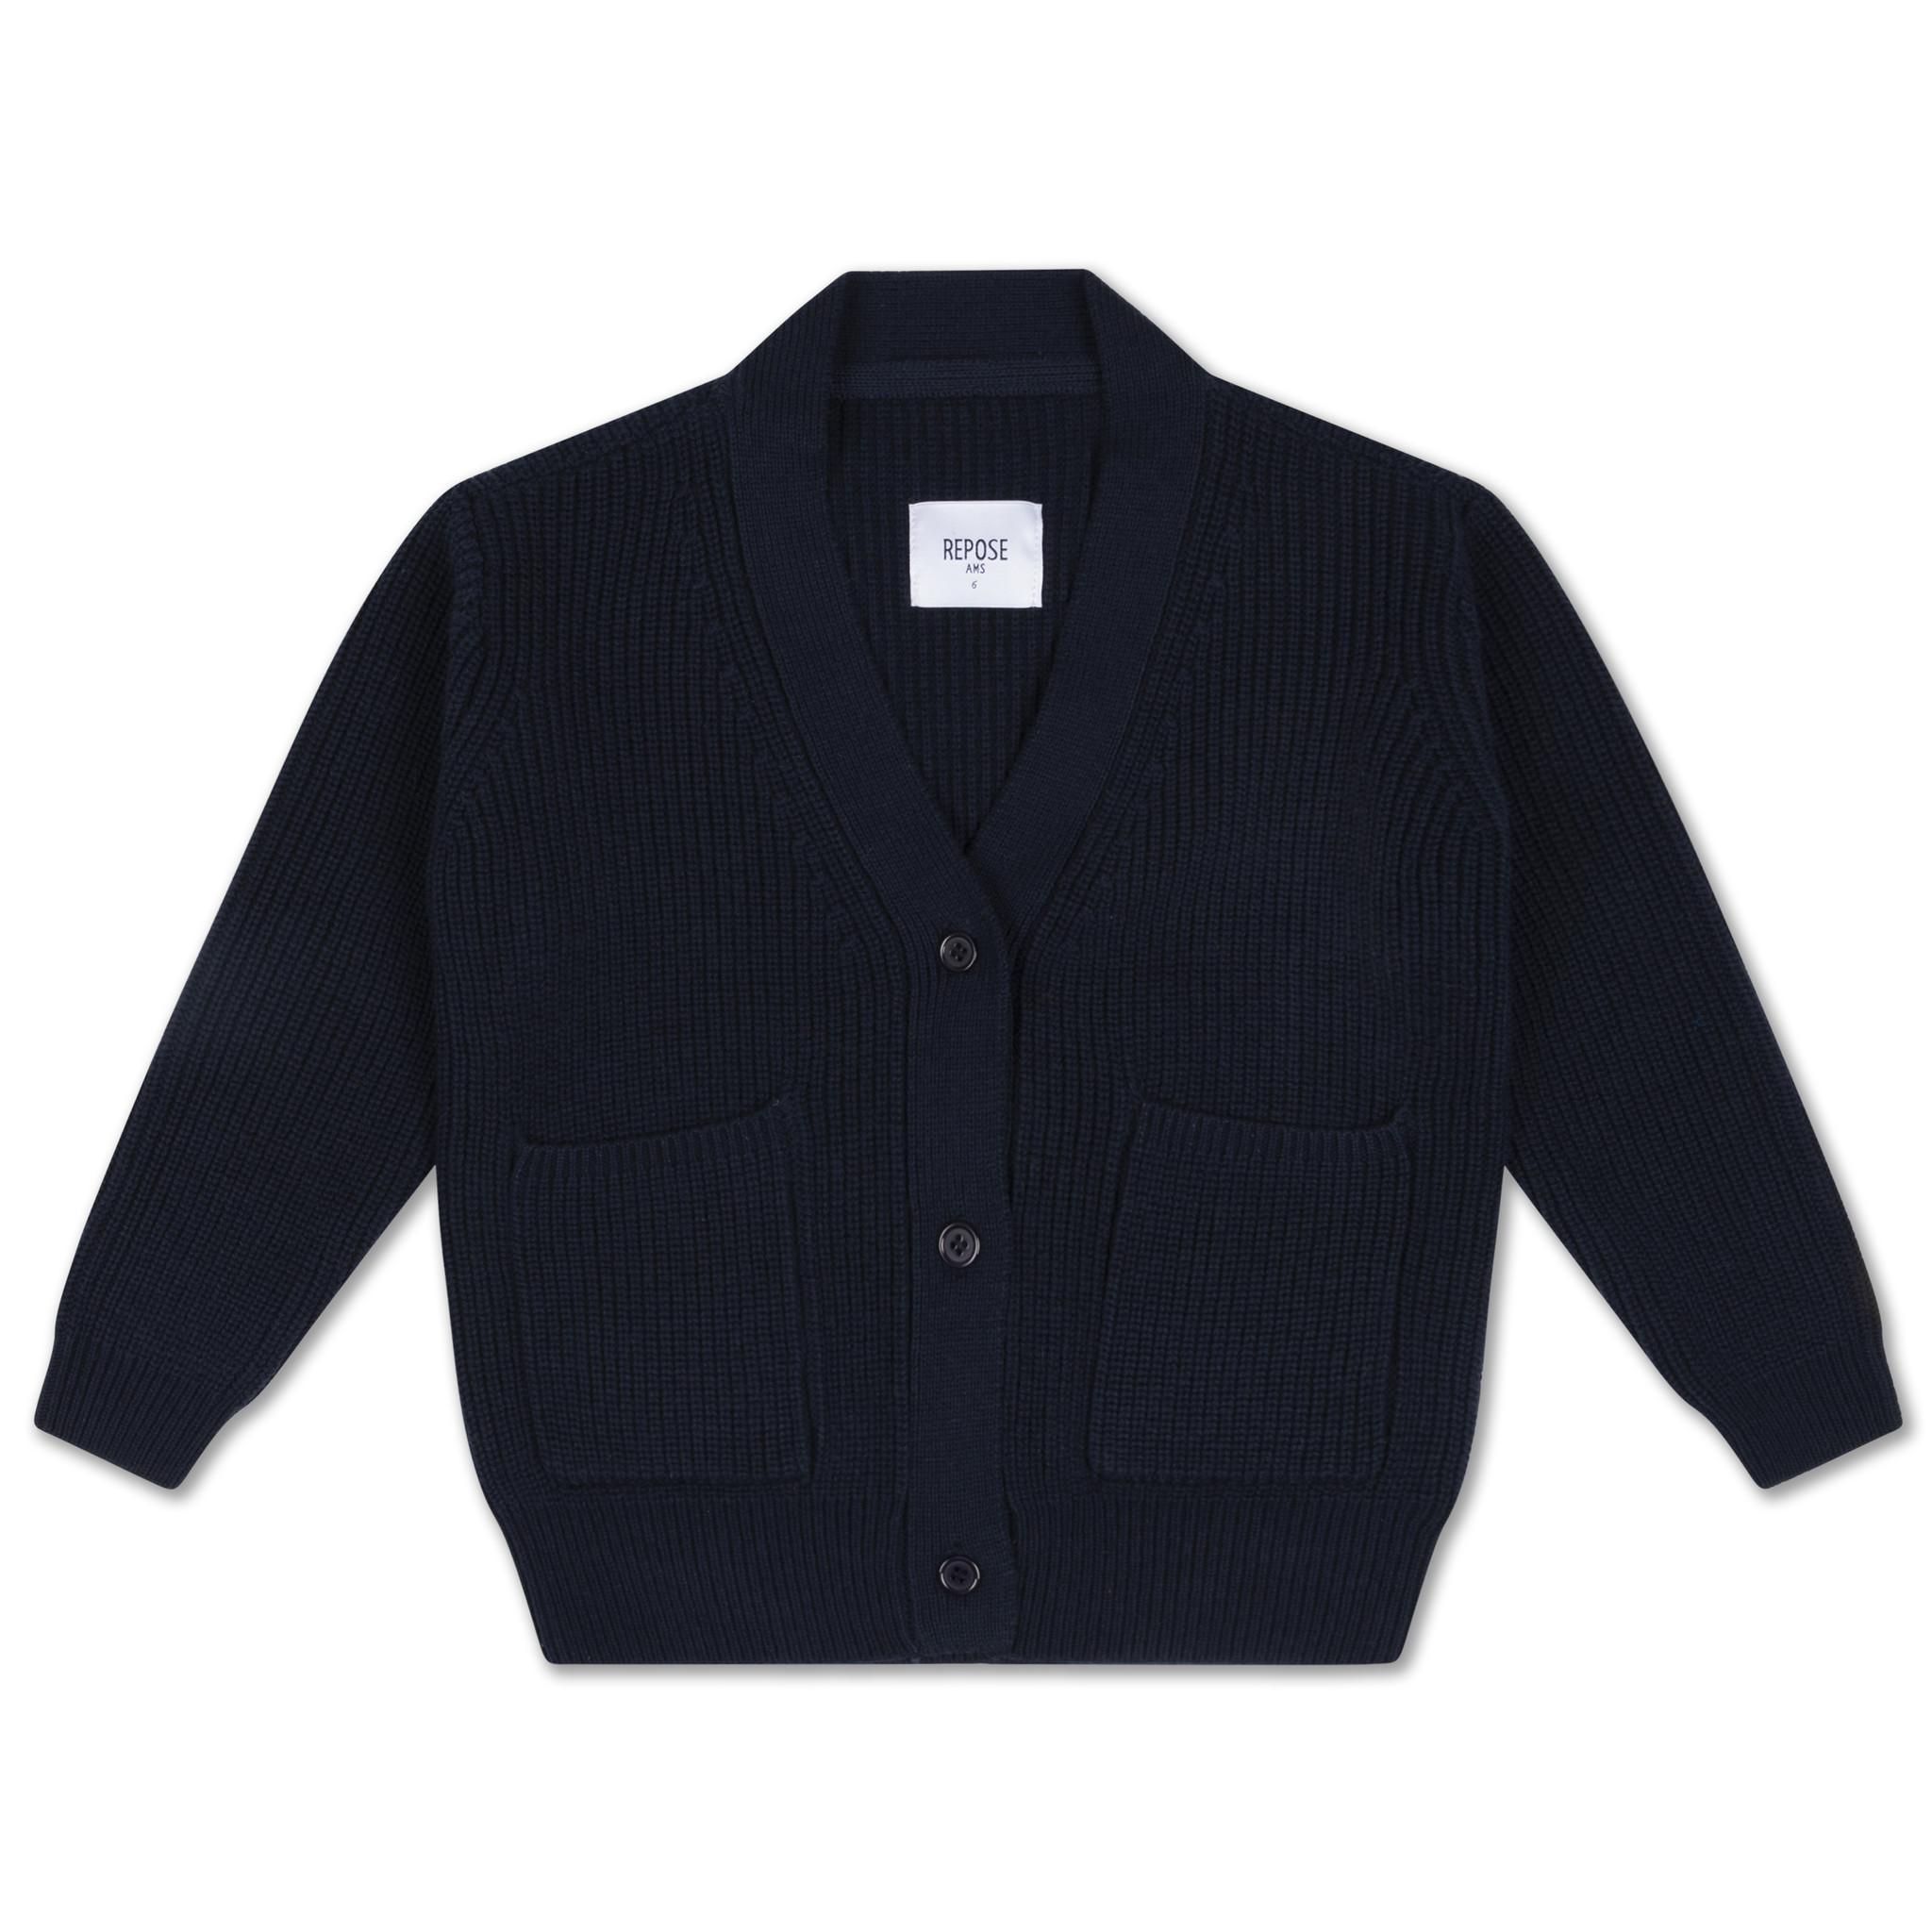 Knit grandpa cardigan - Navy Blue-1